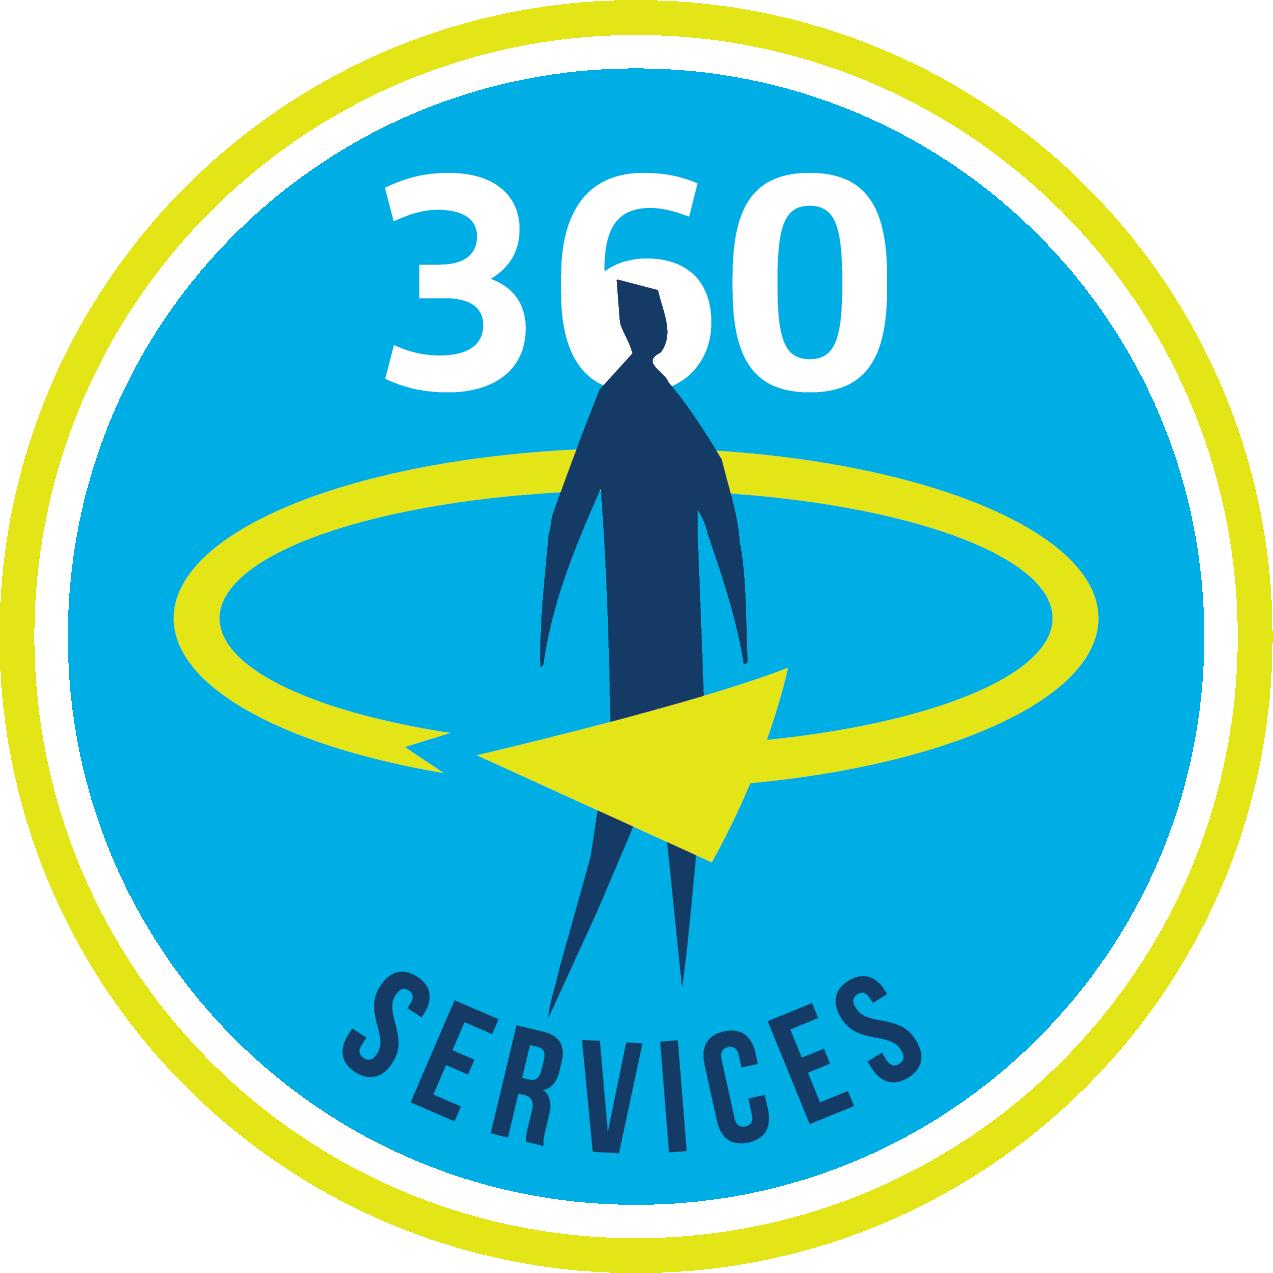 aclvb-universele_diensten-logo-cmyk_ok_fr_0.png